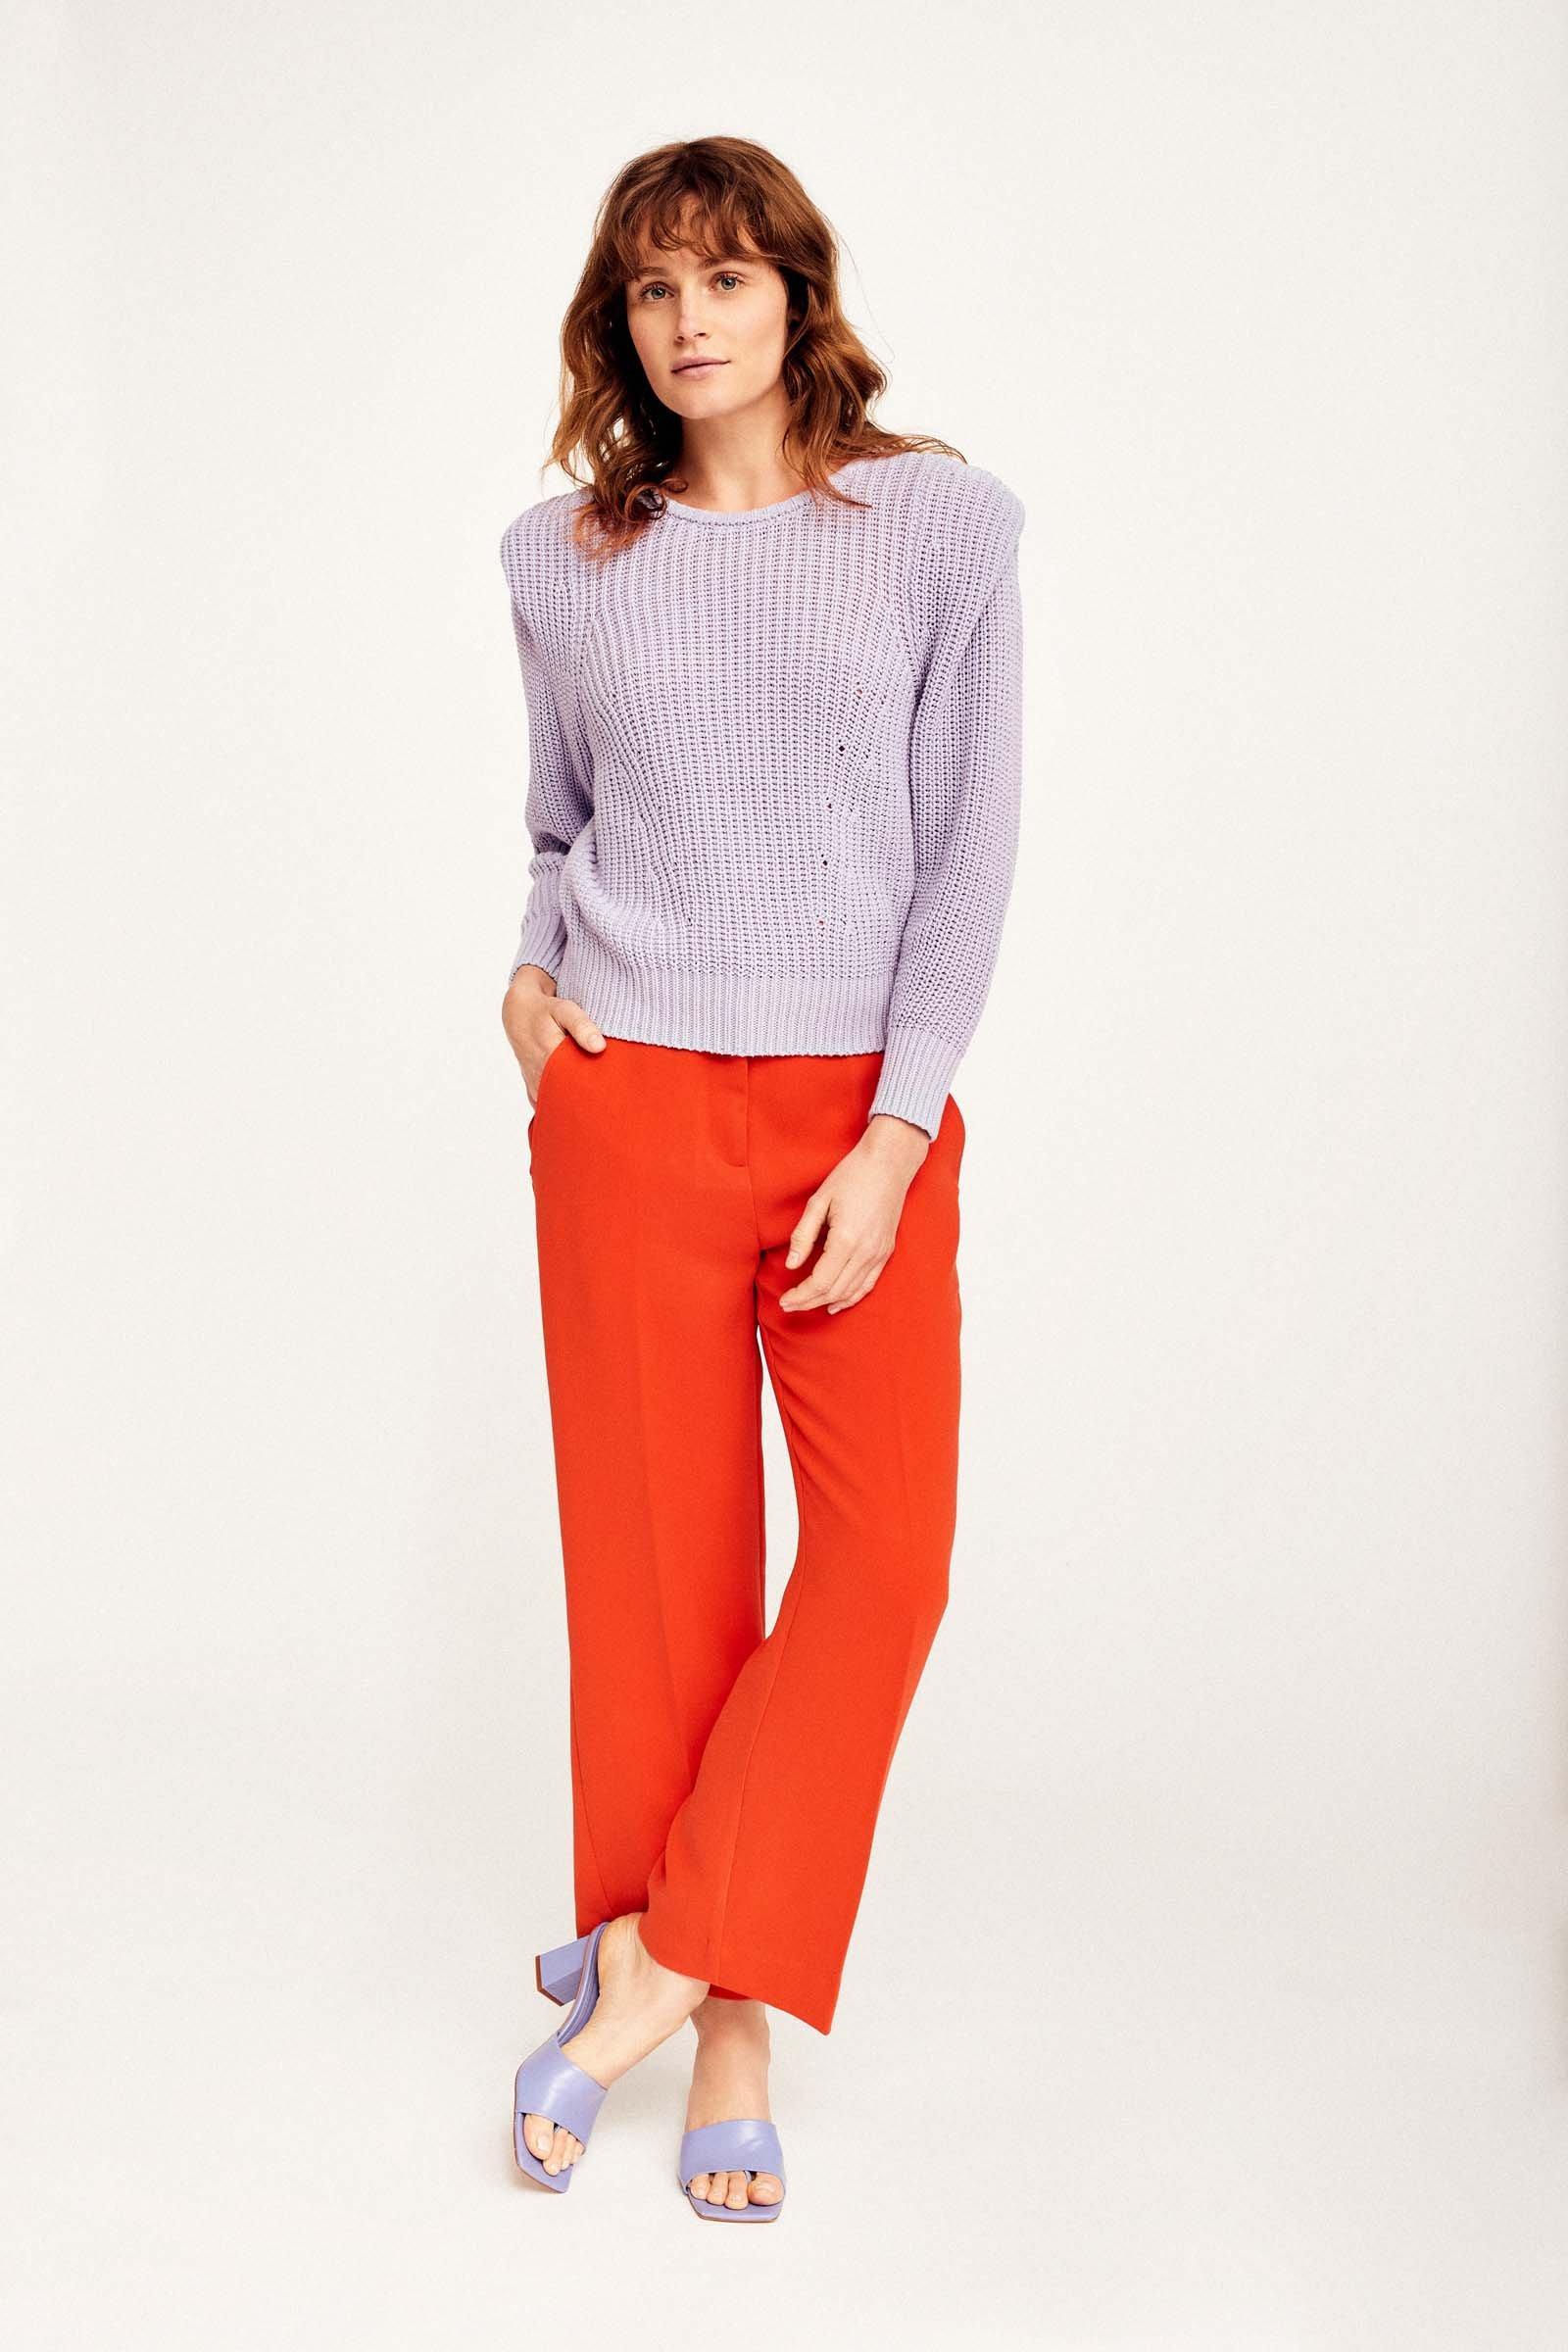 https://webmedia.cks-fashion.com/i/cks/123365ASM_30_f_model